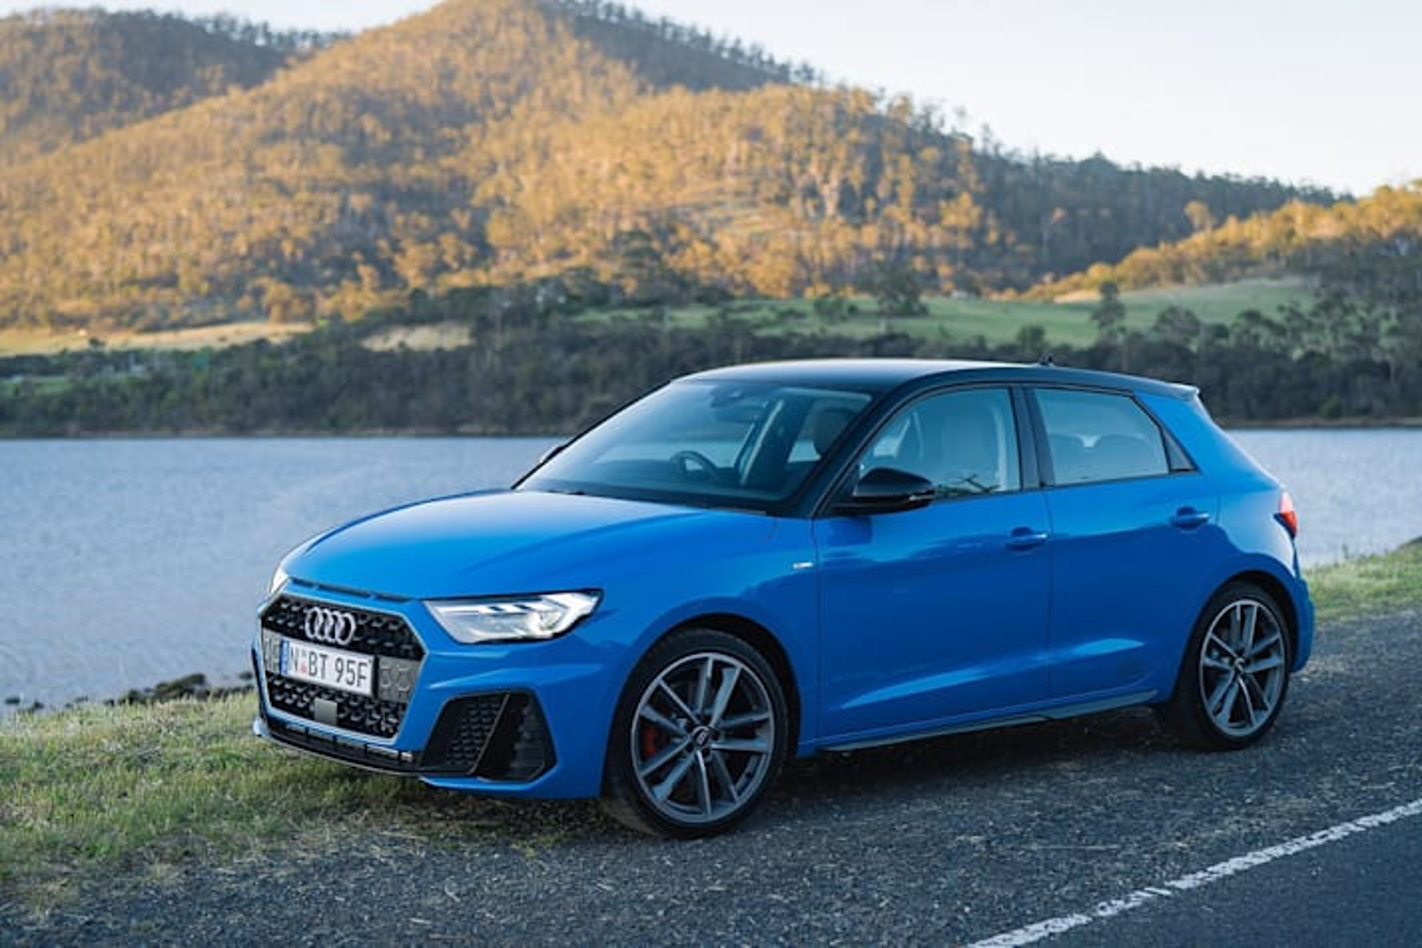 Audi A 1 Car 1 Jpg